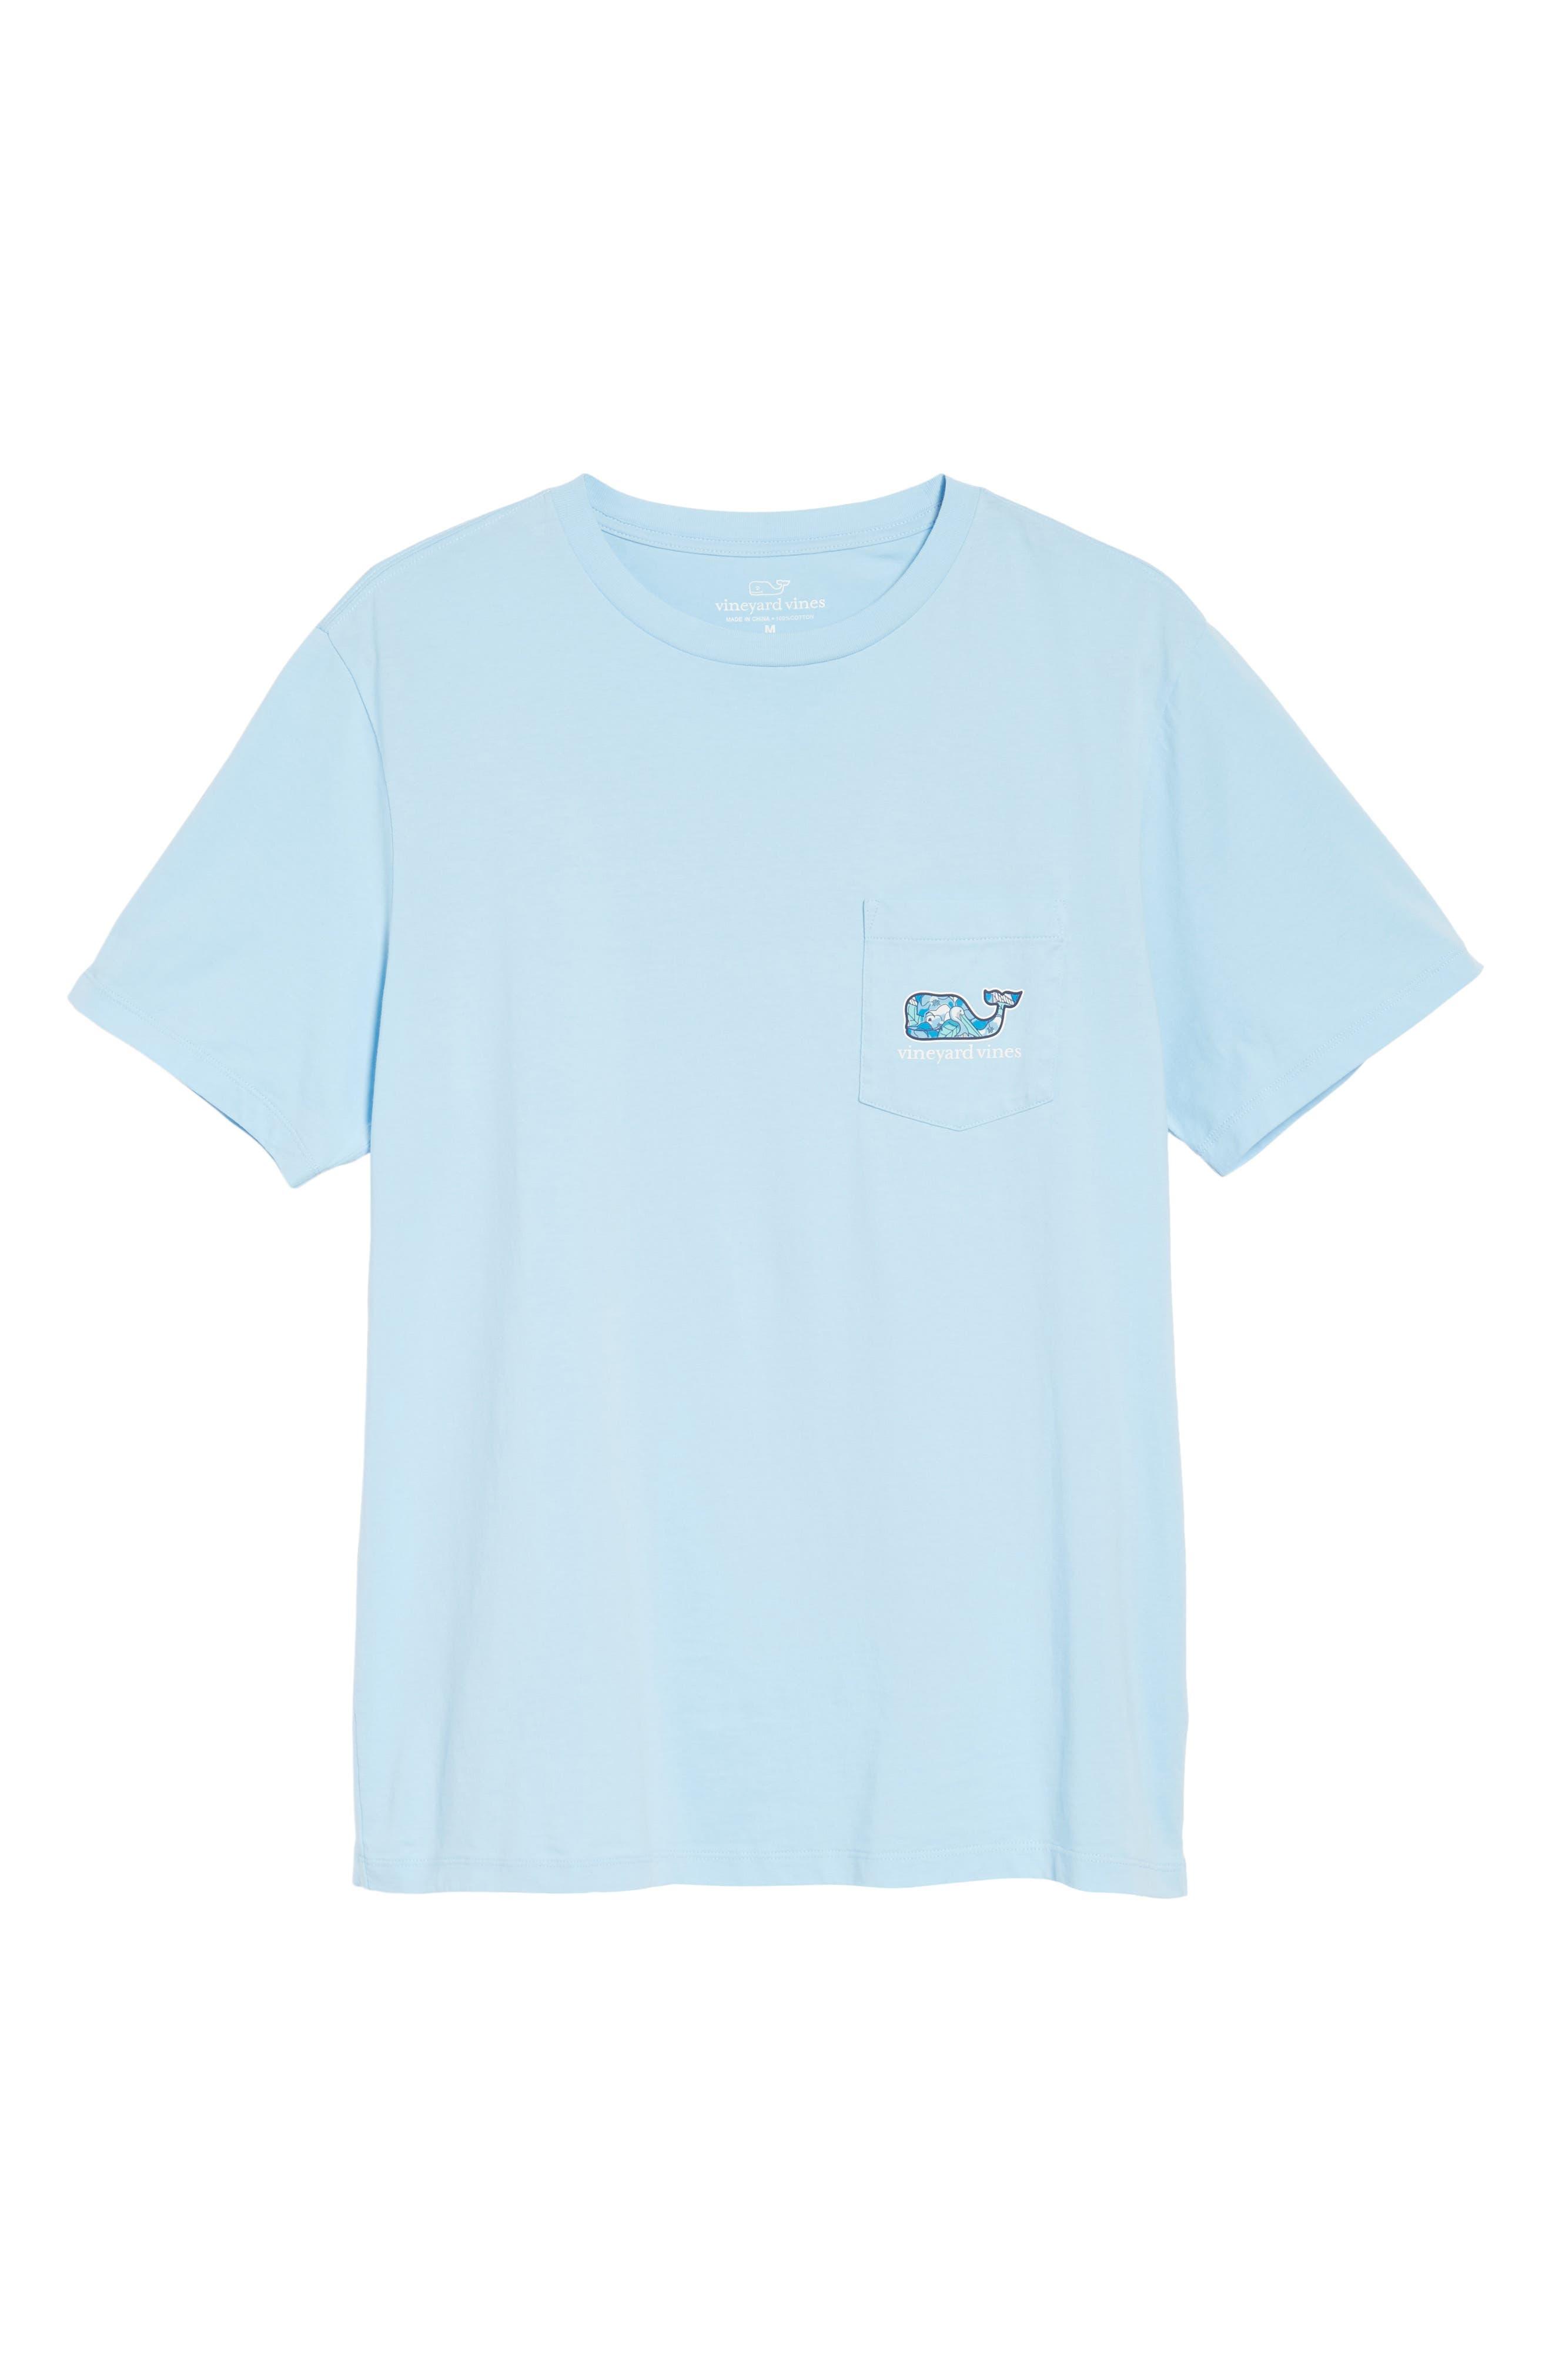 Pelican Magnolias Graphic T-Shirt,                             Alternate thumbnail 6, color,                             413